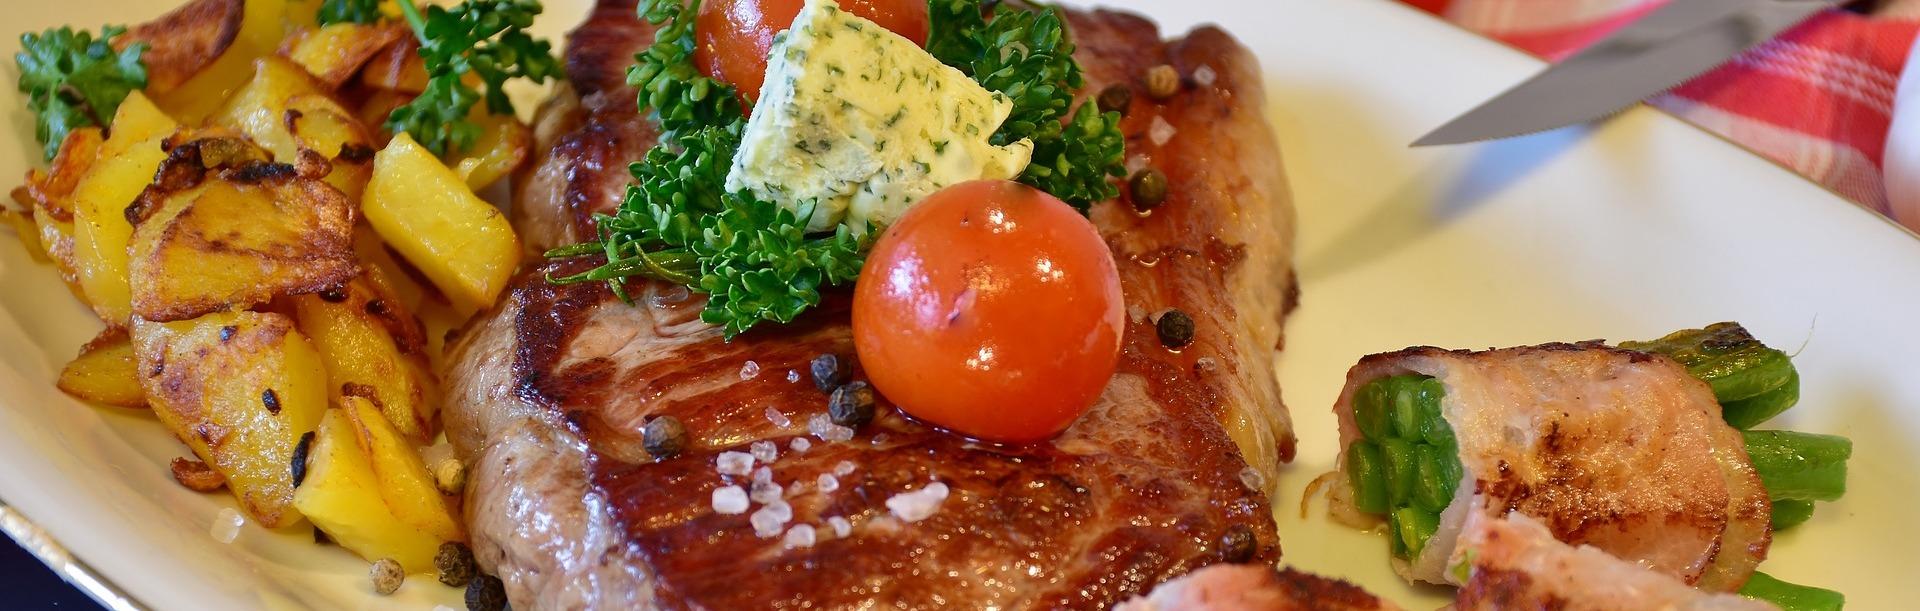 Steakhouse im Rohrbachtal